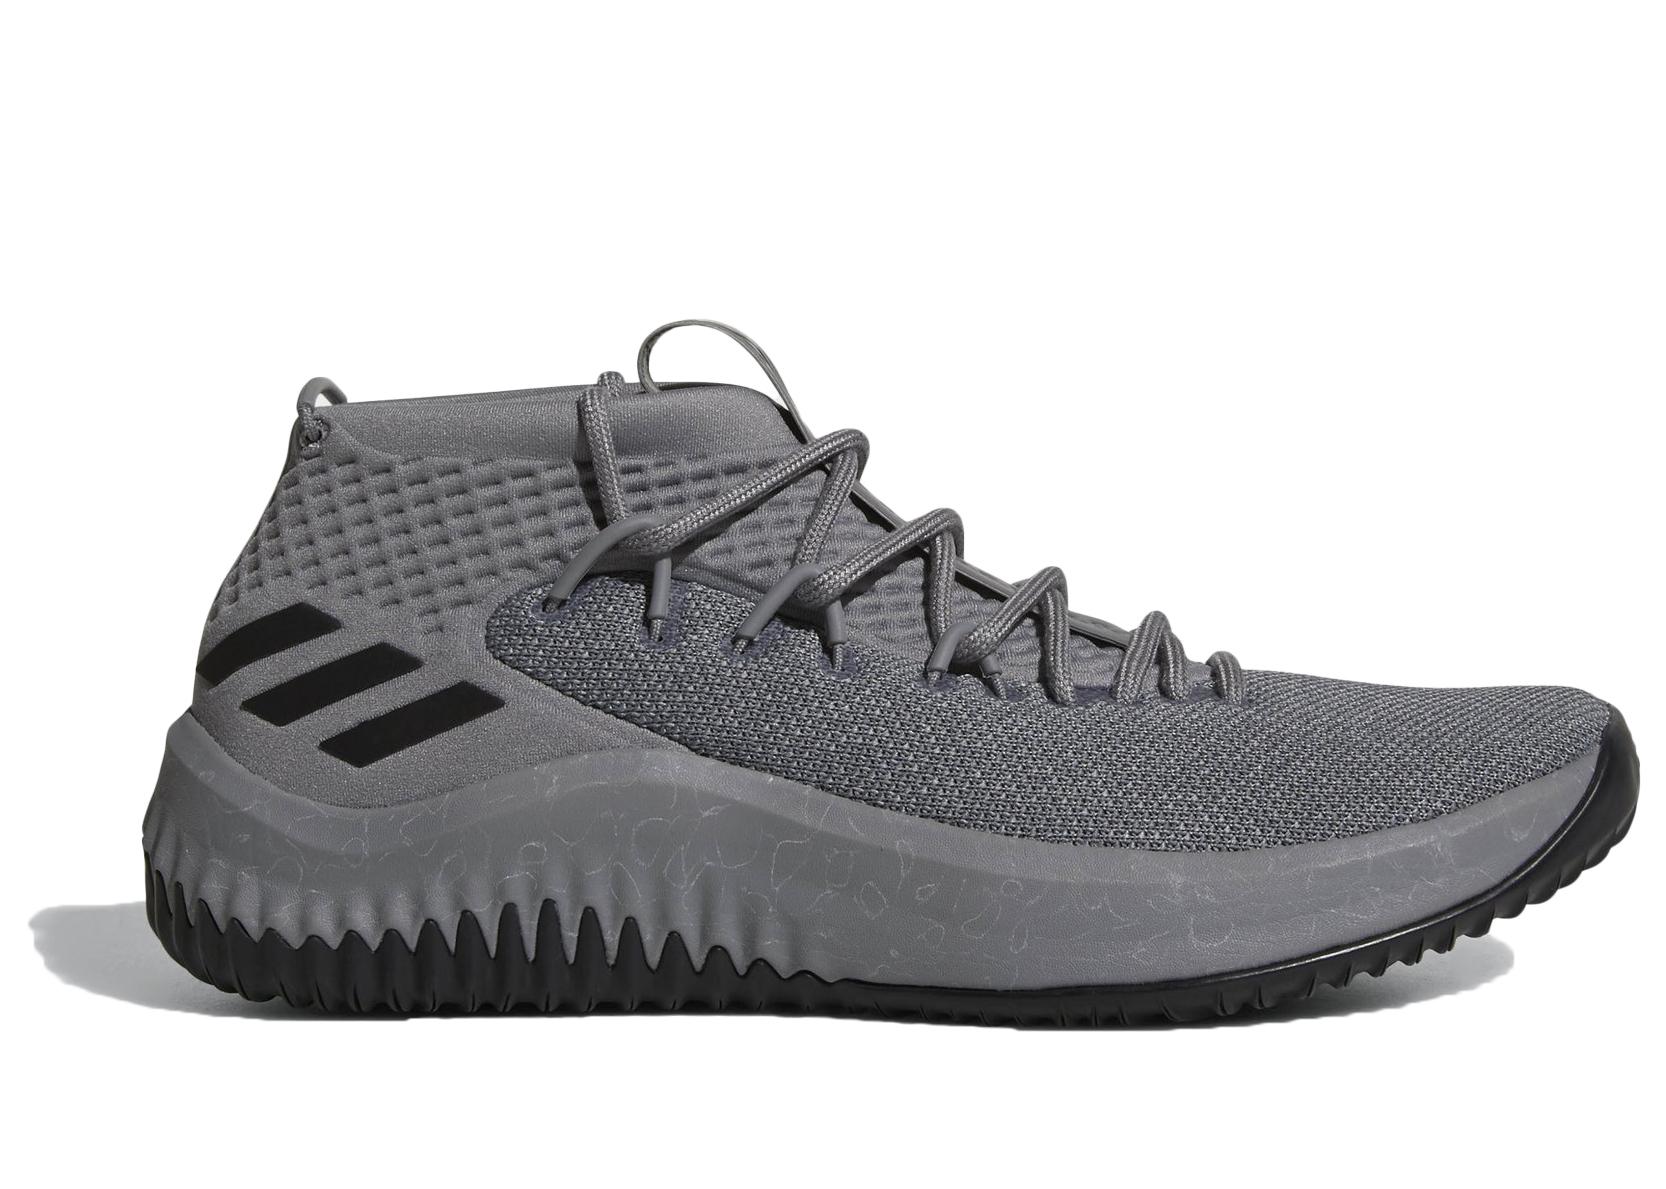 adidas Dame 4 Grey - CQ0474